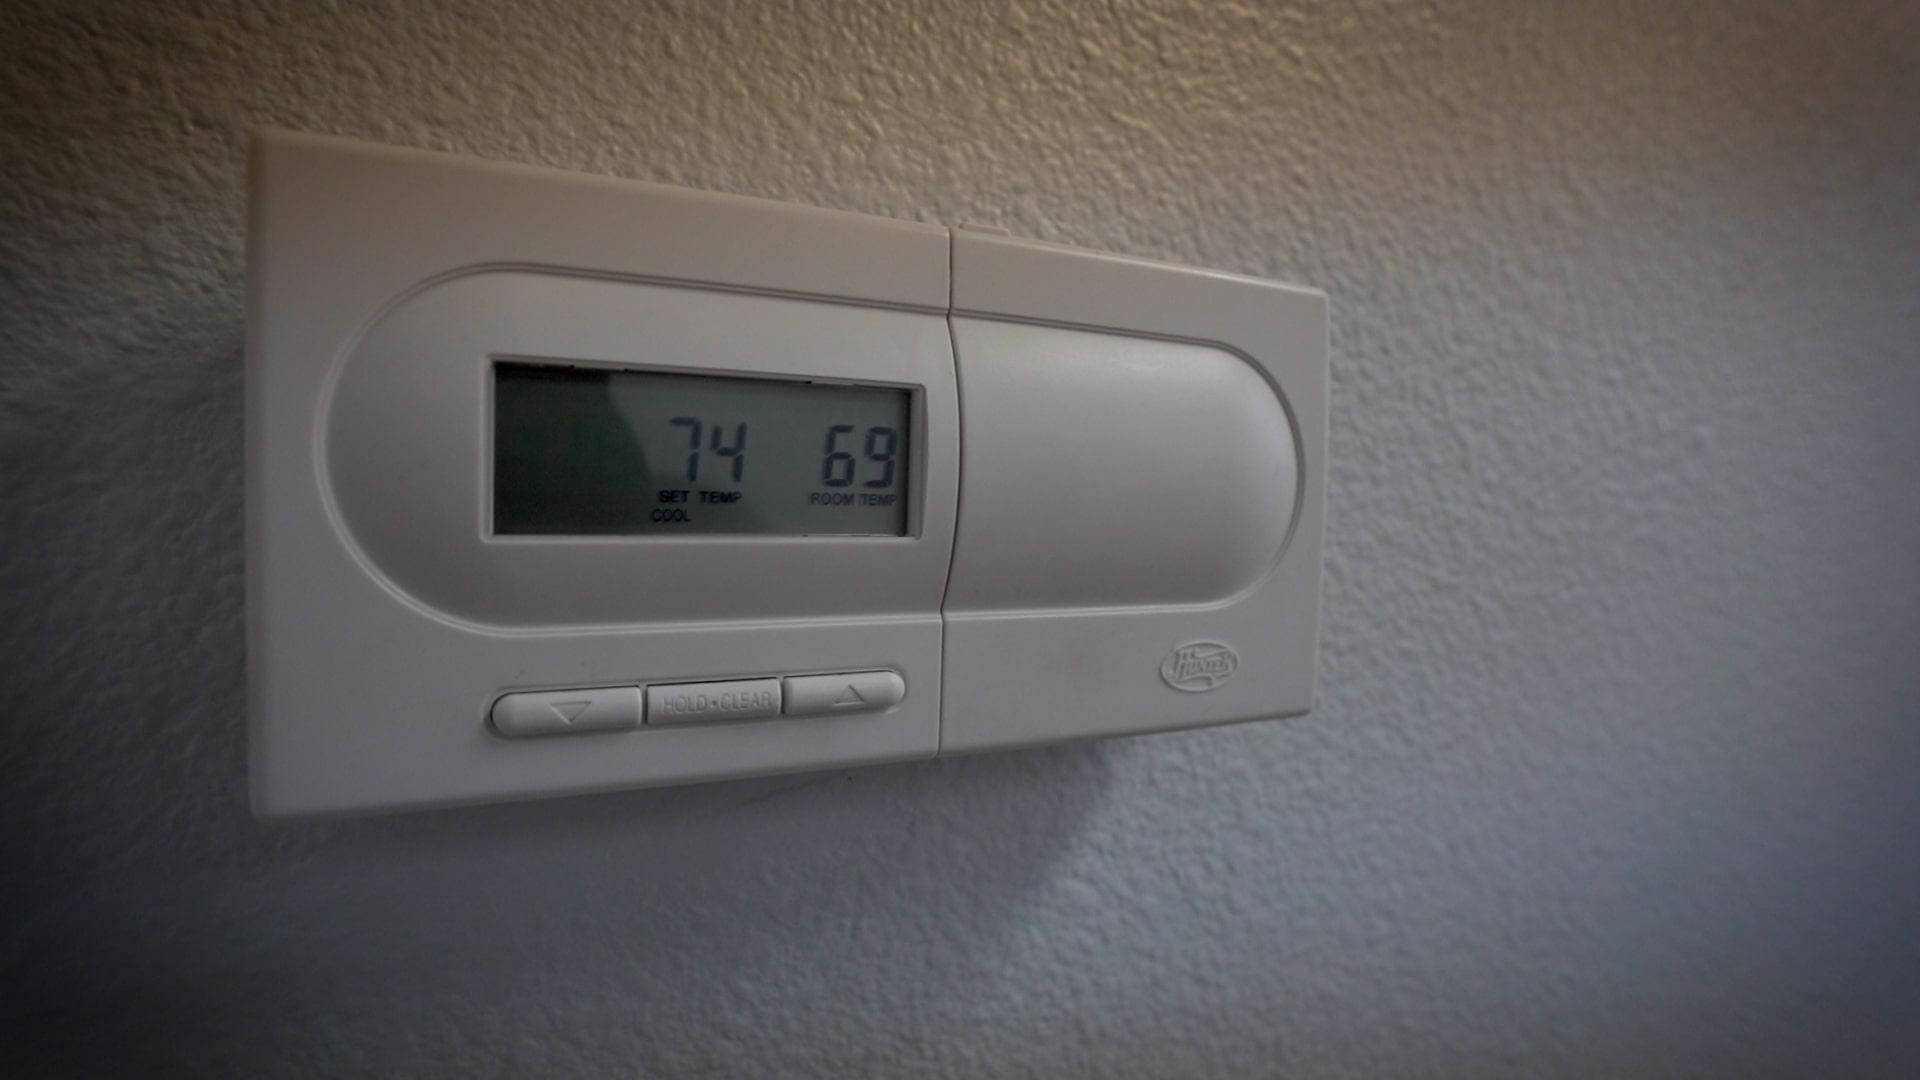 Event Center Thermostat